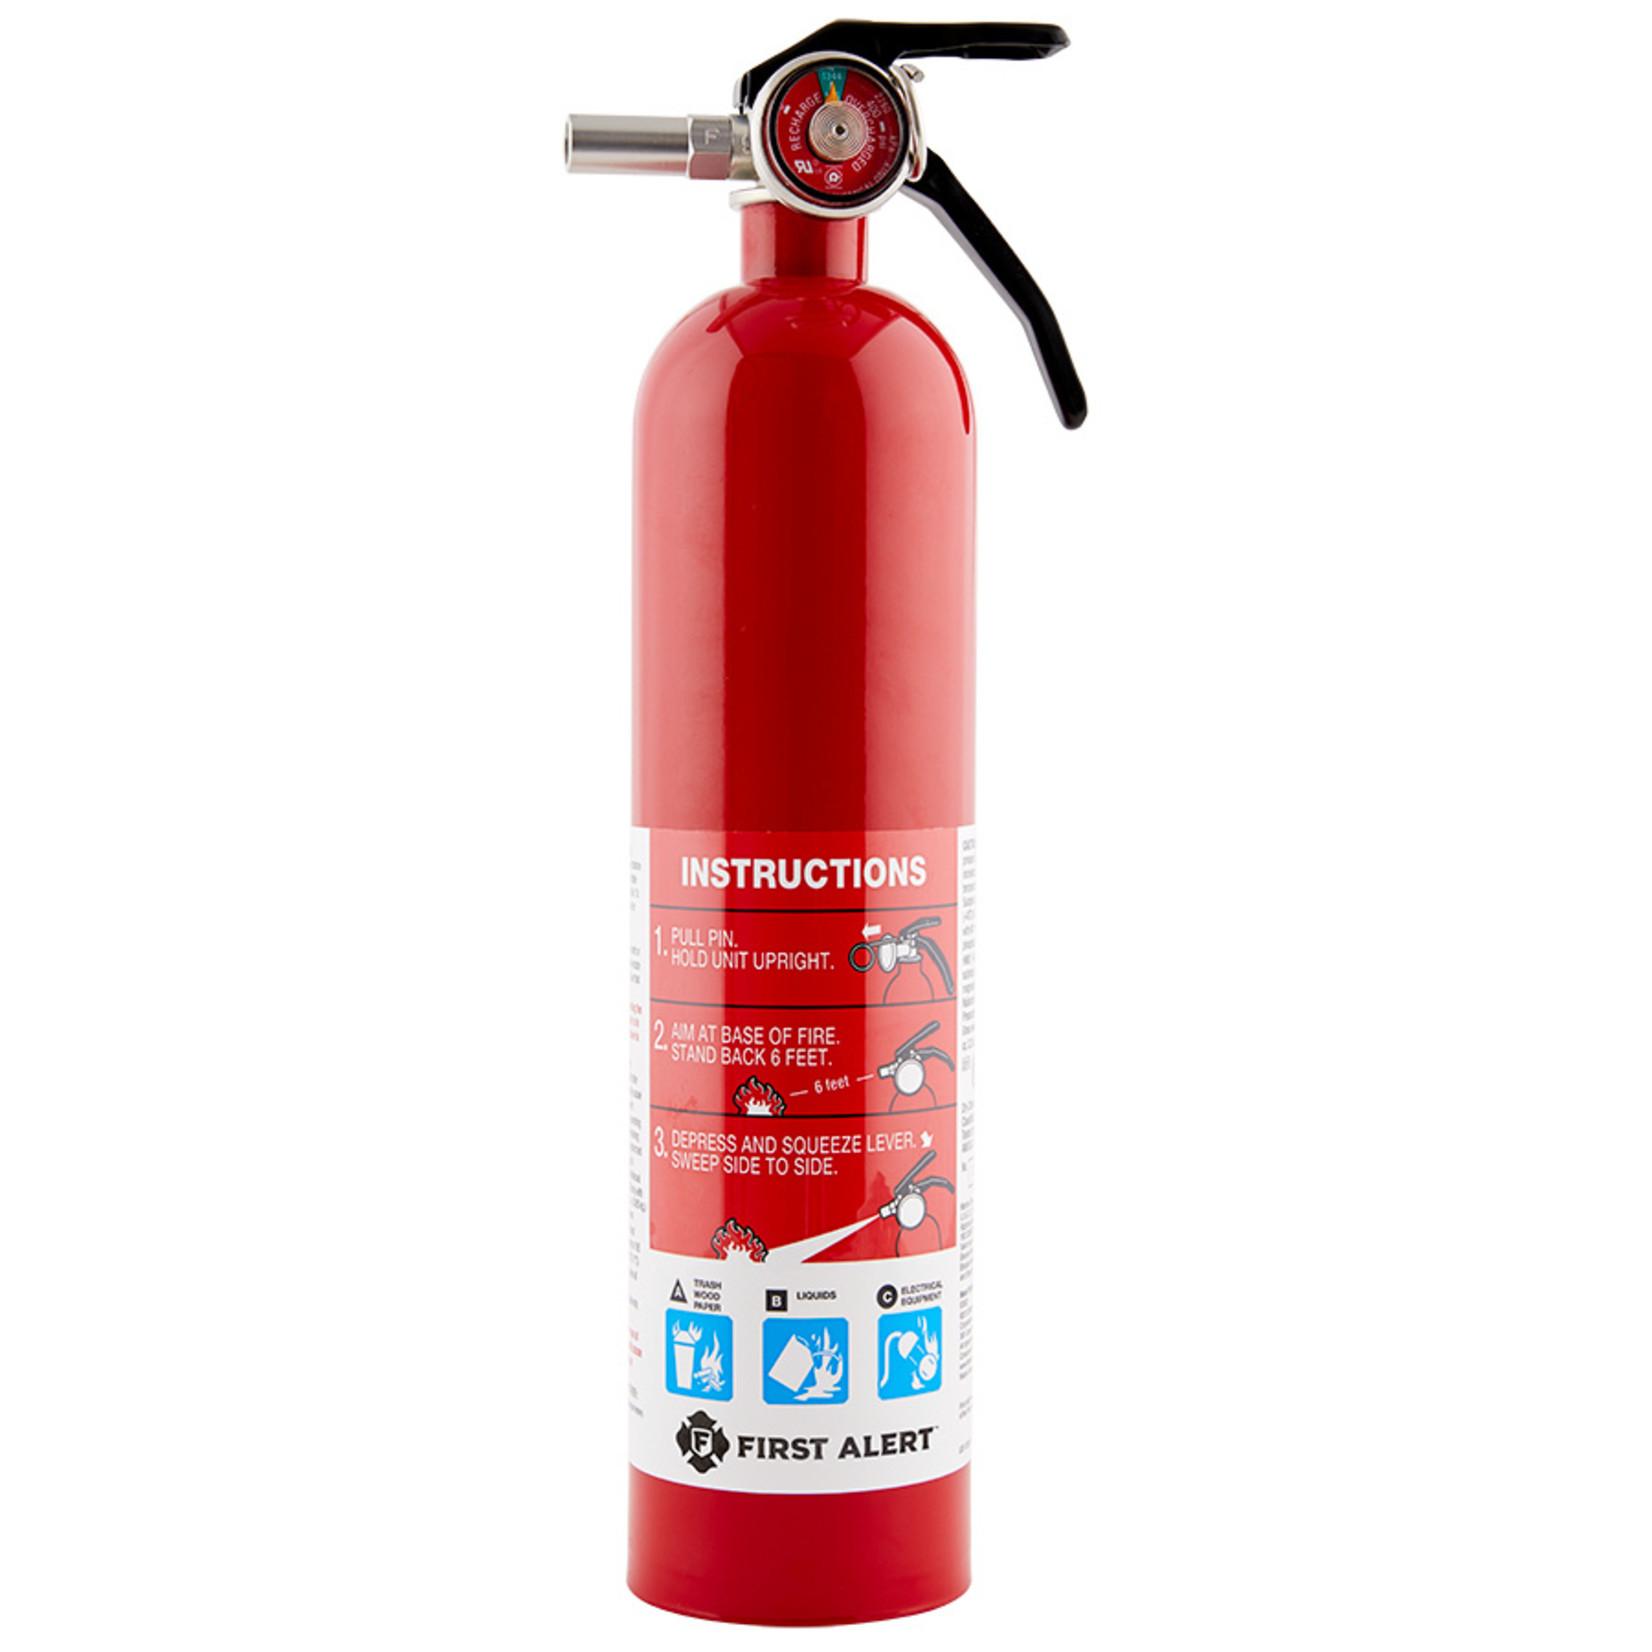 BRK BRK PRO 2.5lb Fire Extinguisher